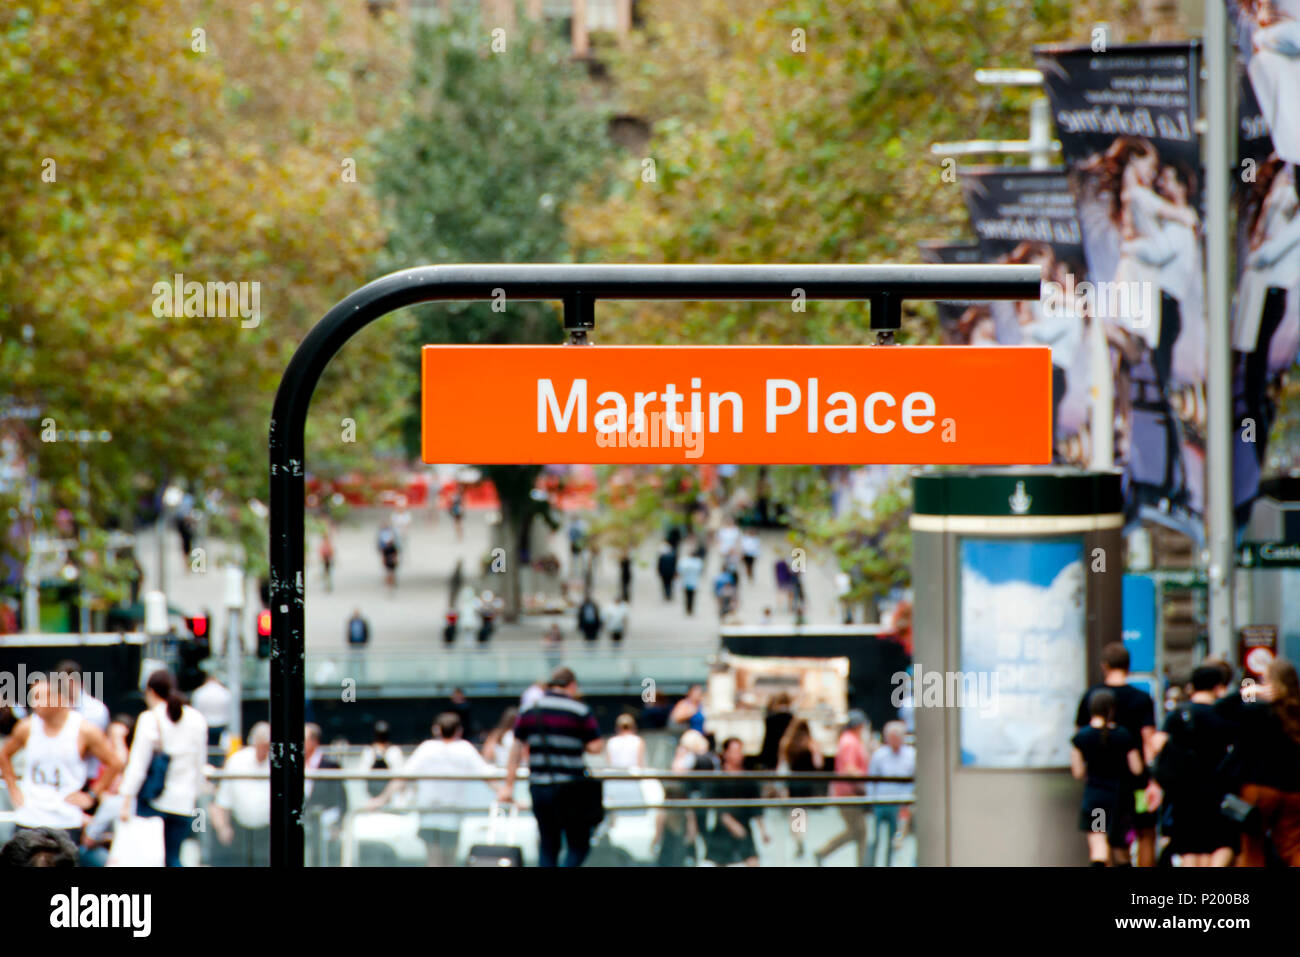 Martin Pl - Sydney - Australia - Stock Image